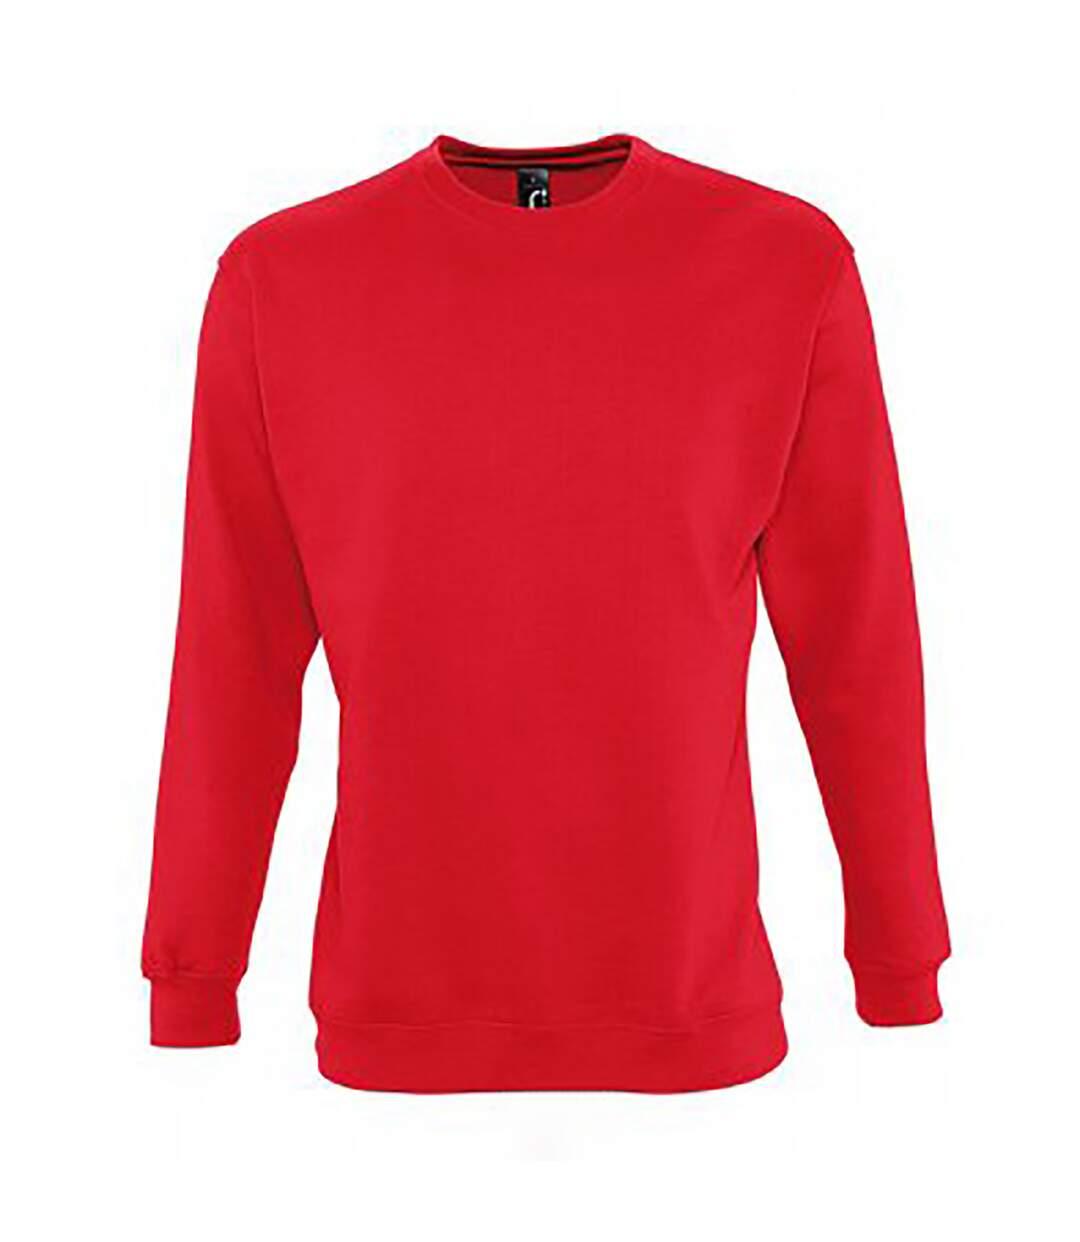 SOLS Supreme - Sweat-shirt - Homme (Rouge) - UTPC2837